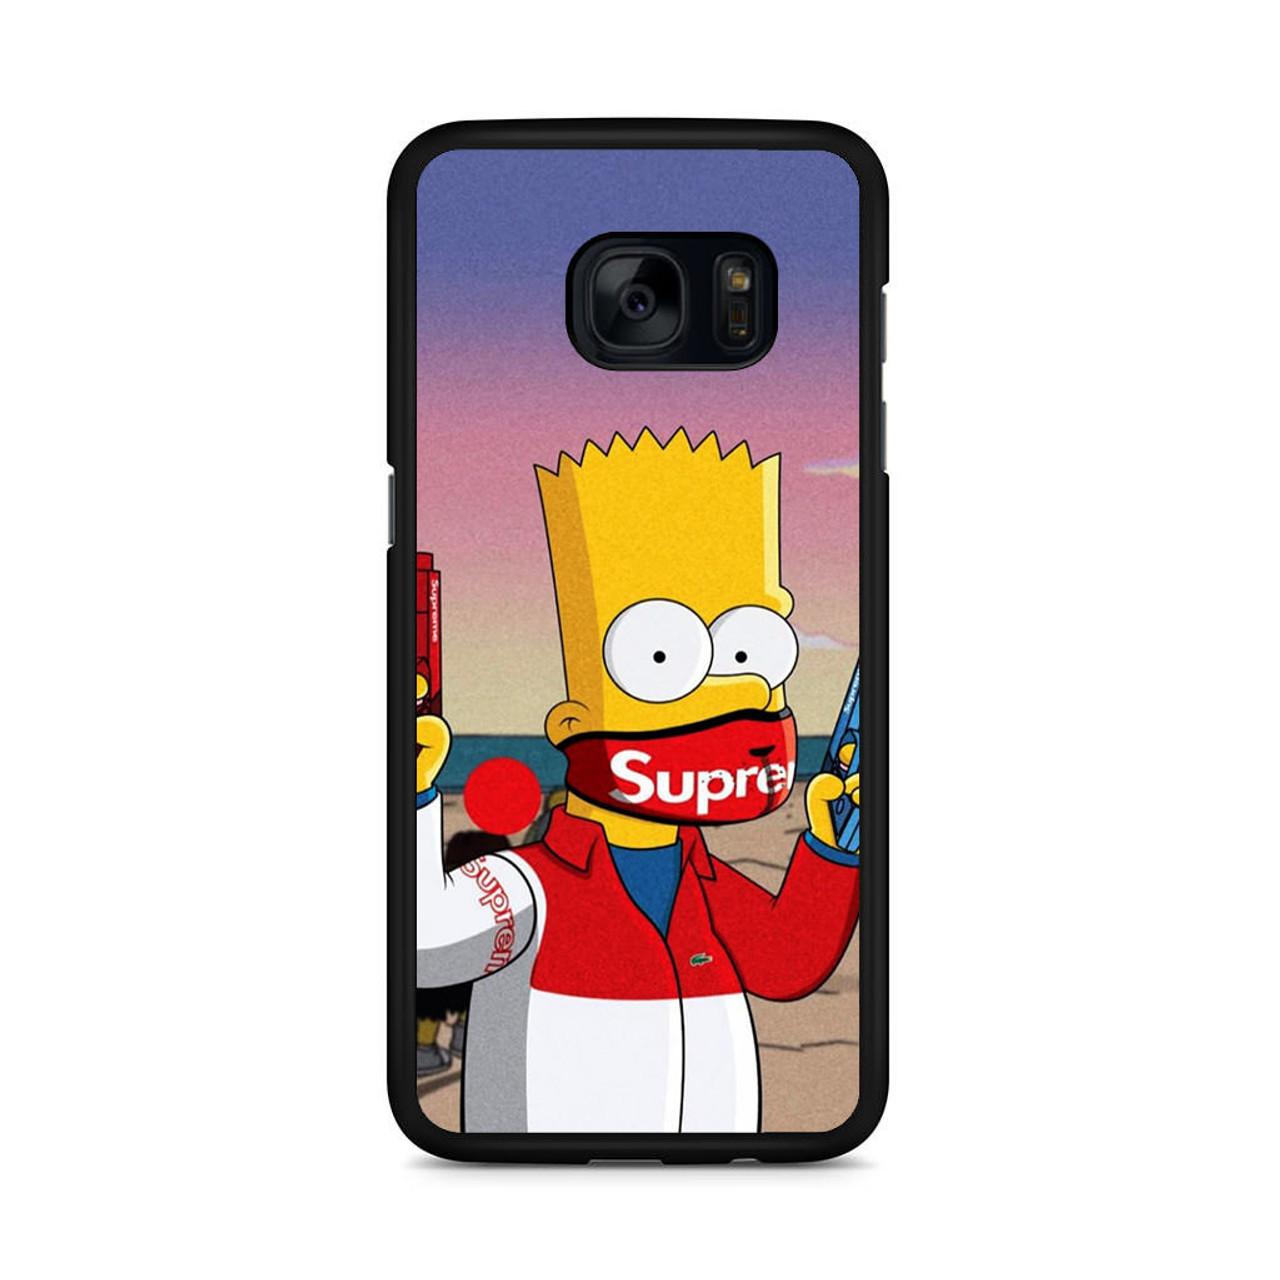 6857d88d2 Bart Supreme Samsung Galaxy S7 Edge Case - CASESHUNTER